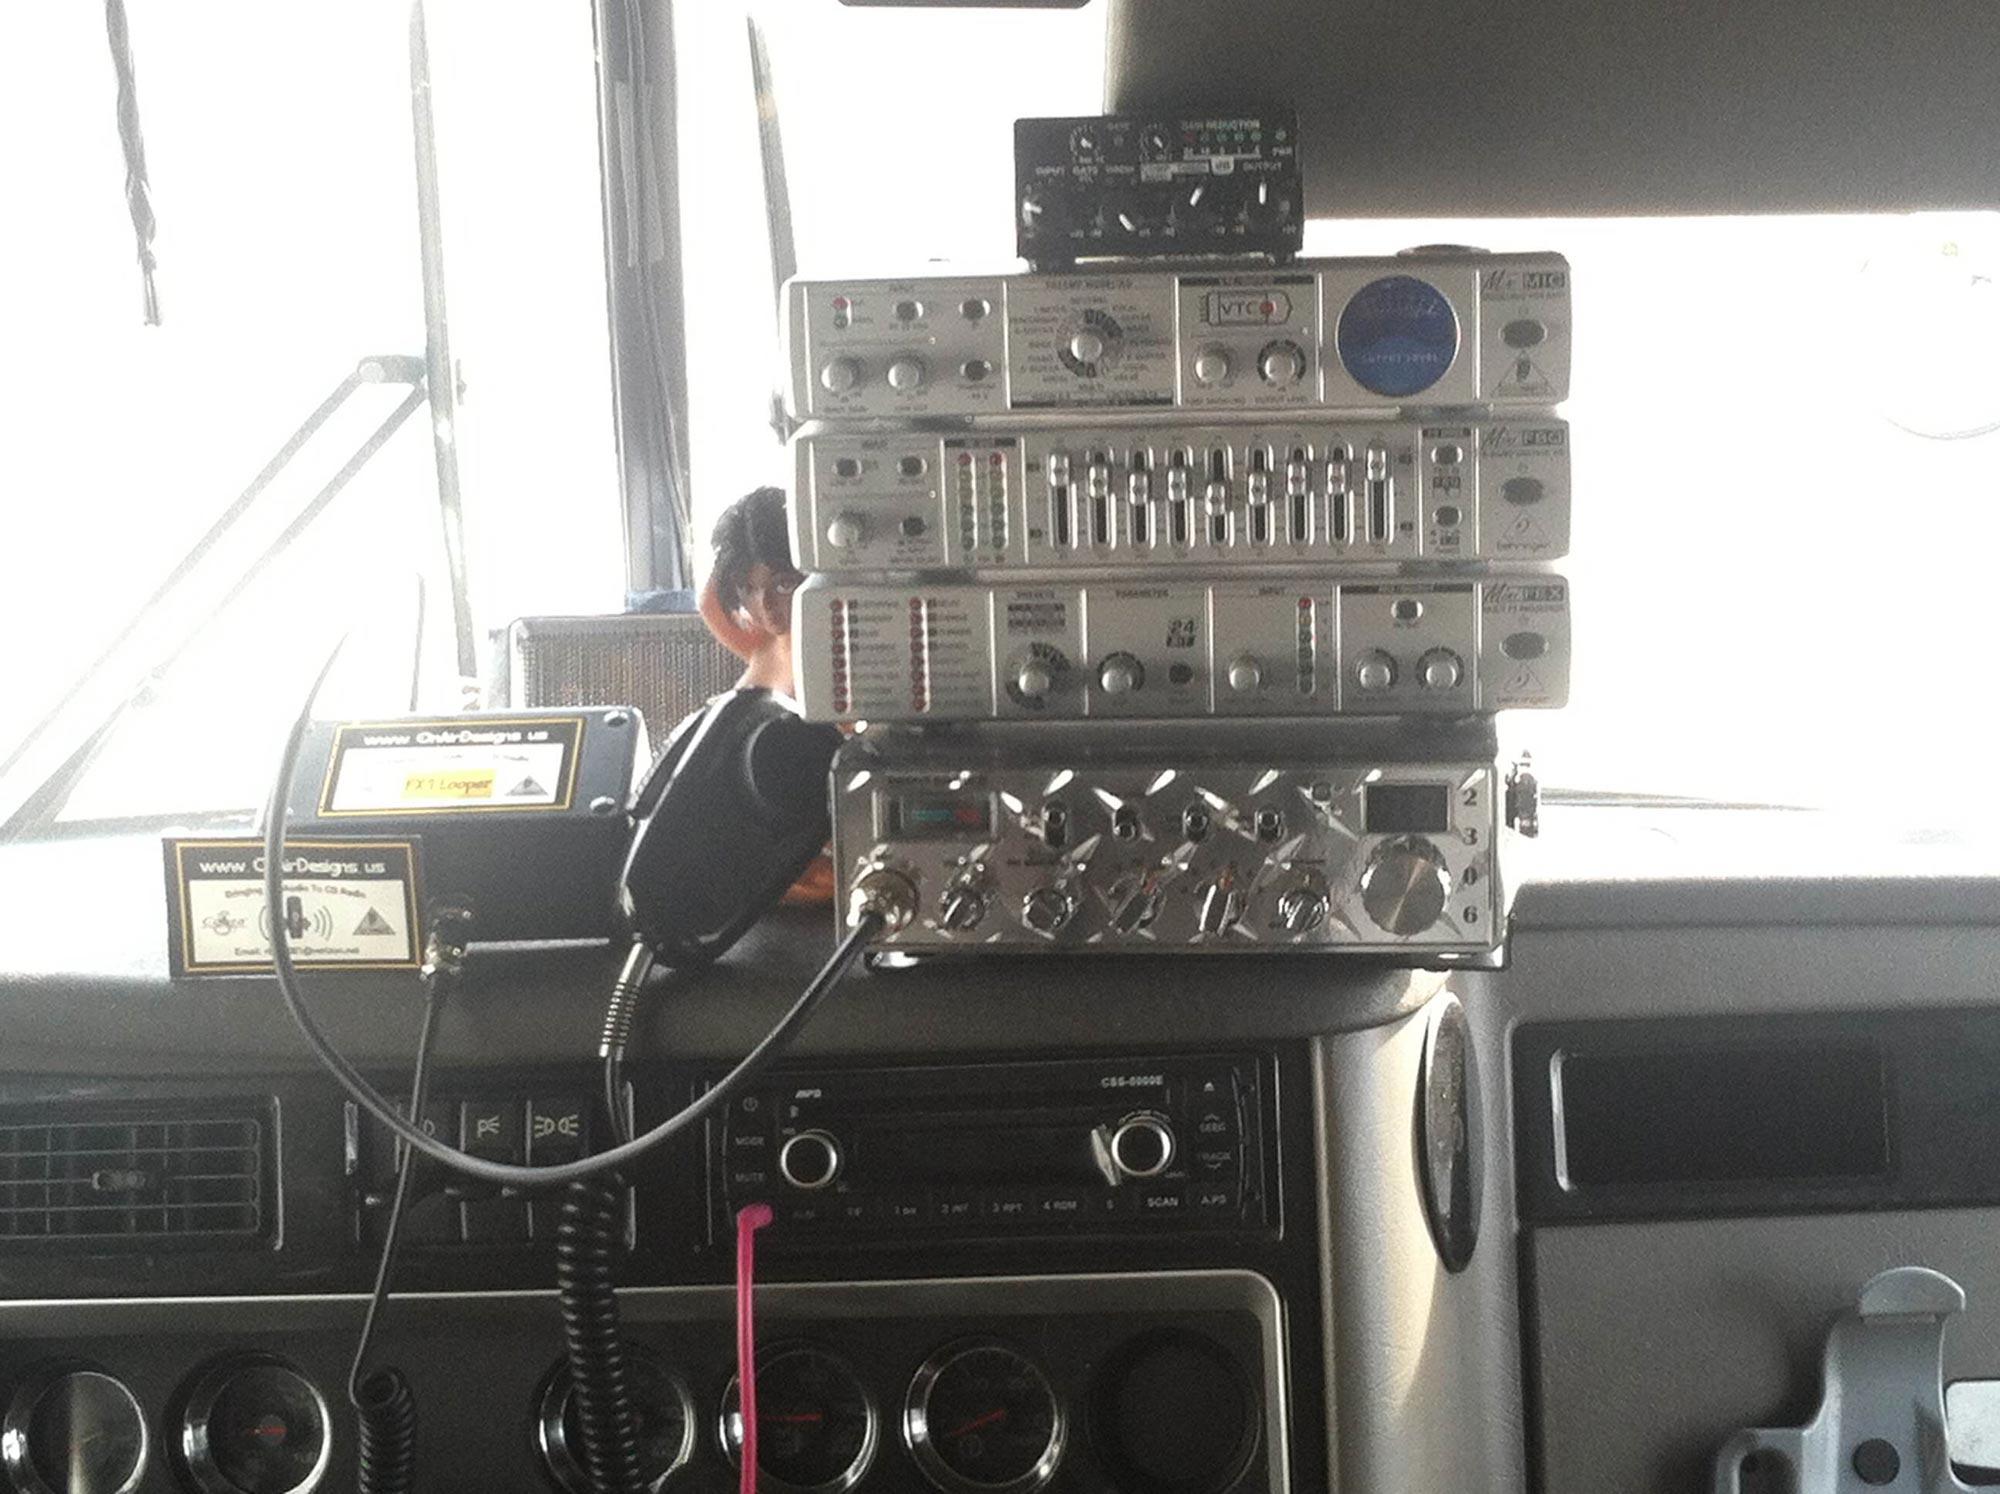 Rob B's Custom Mobile base station in Florida